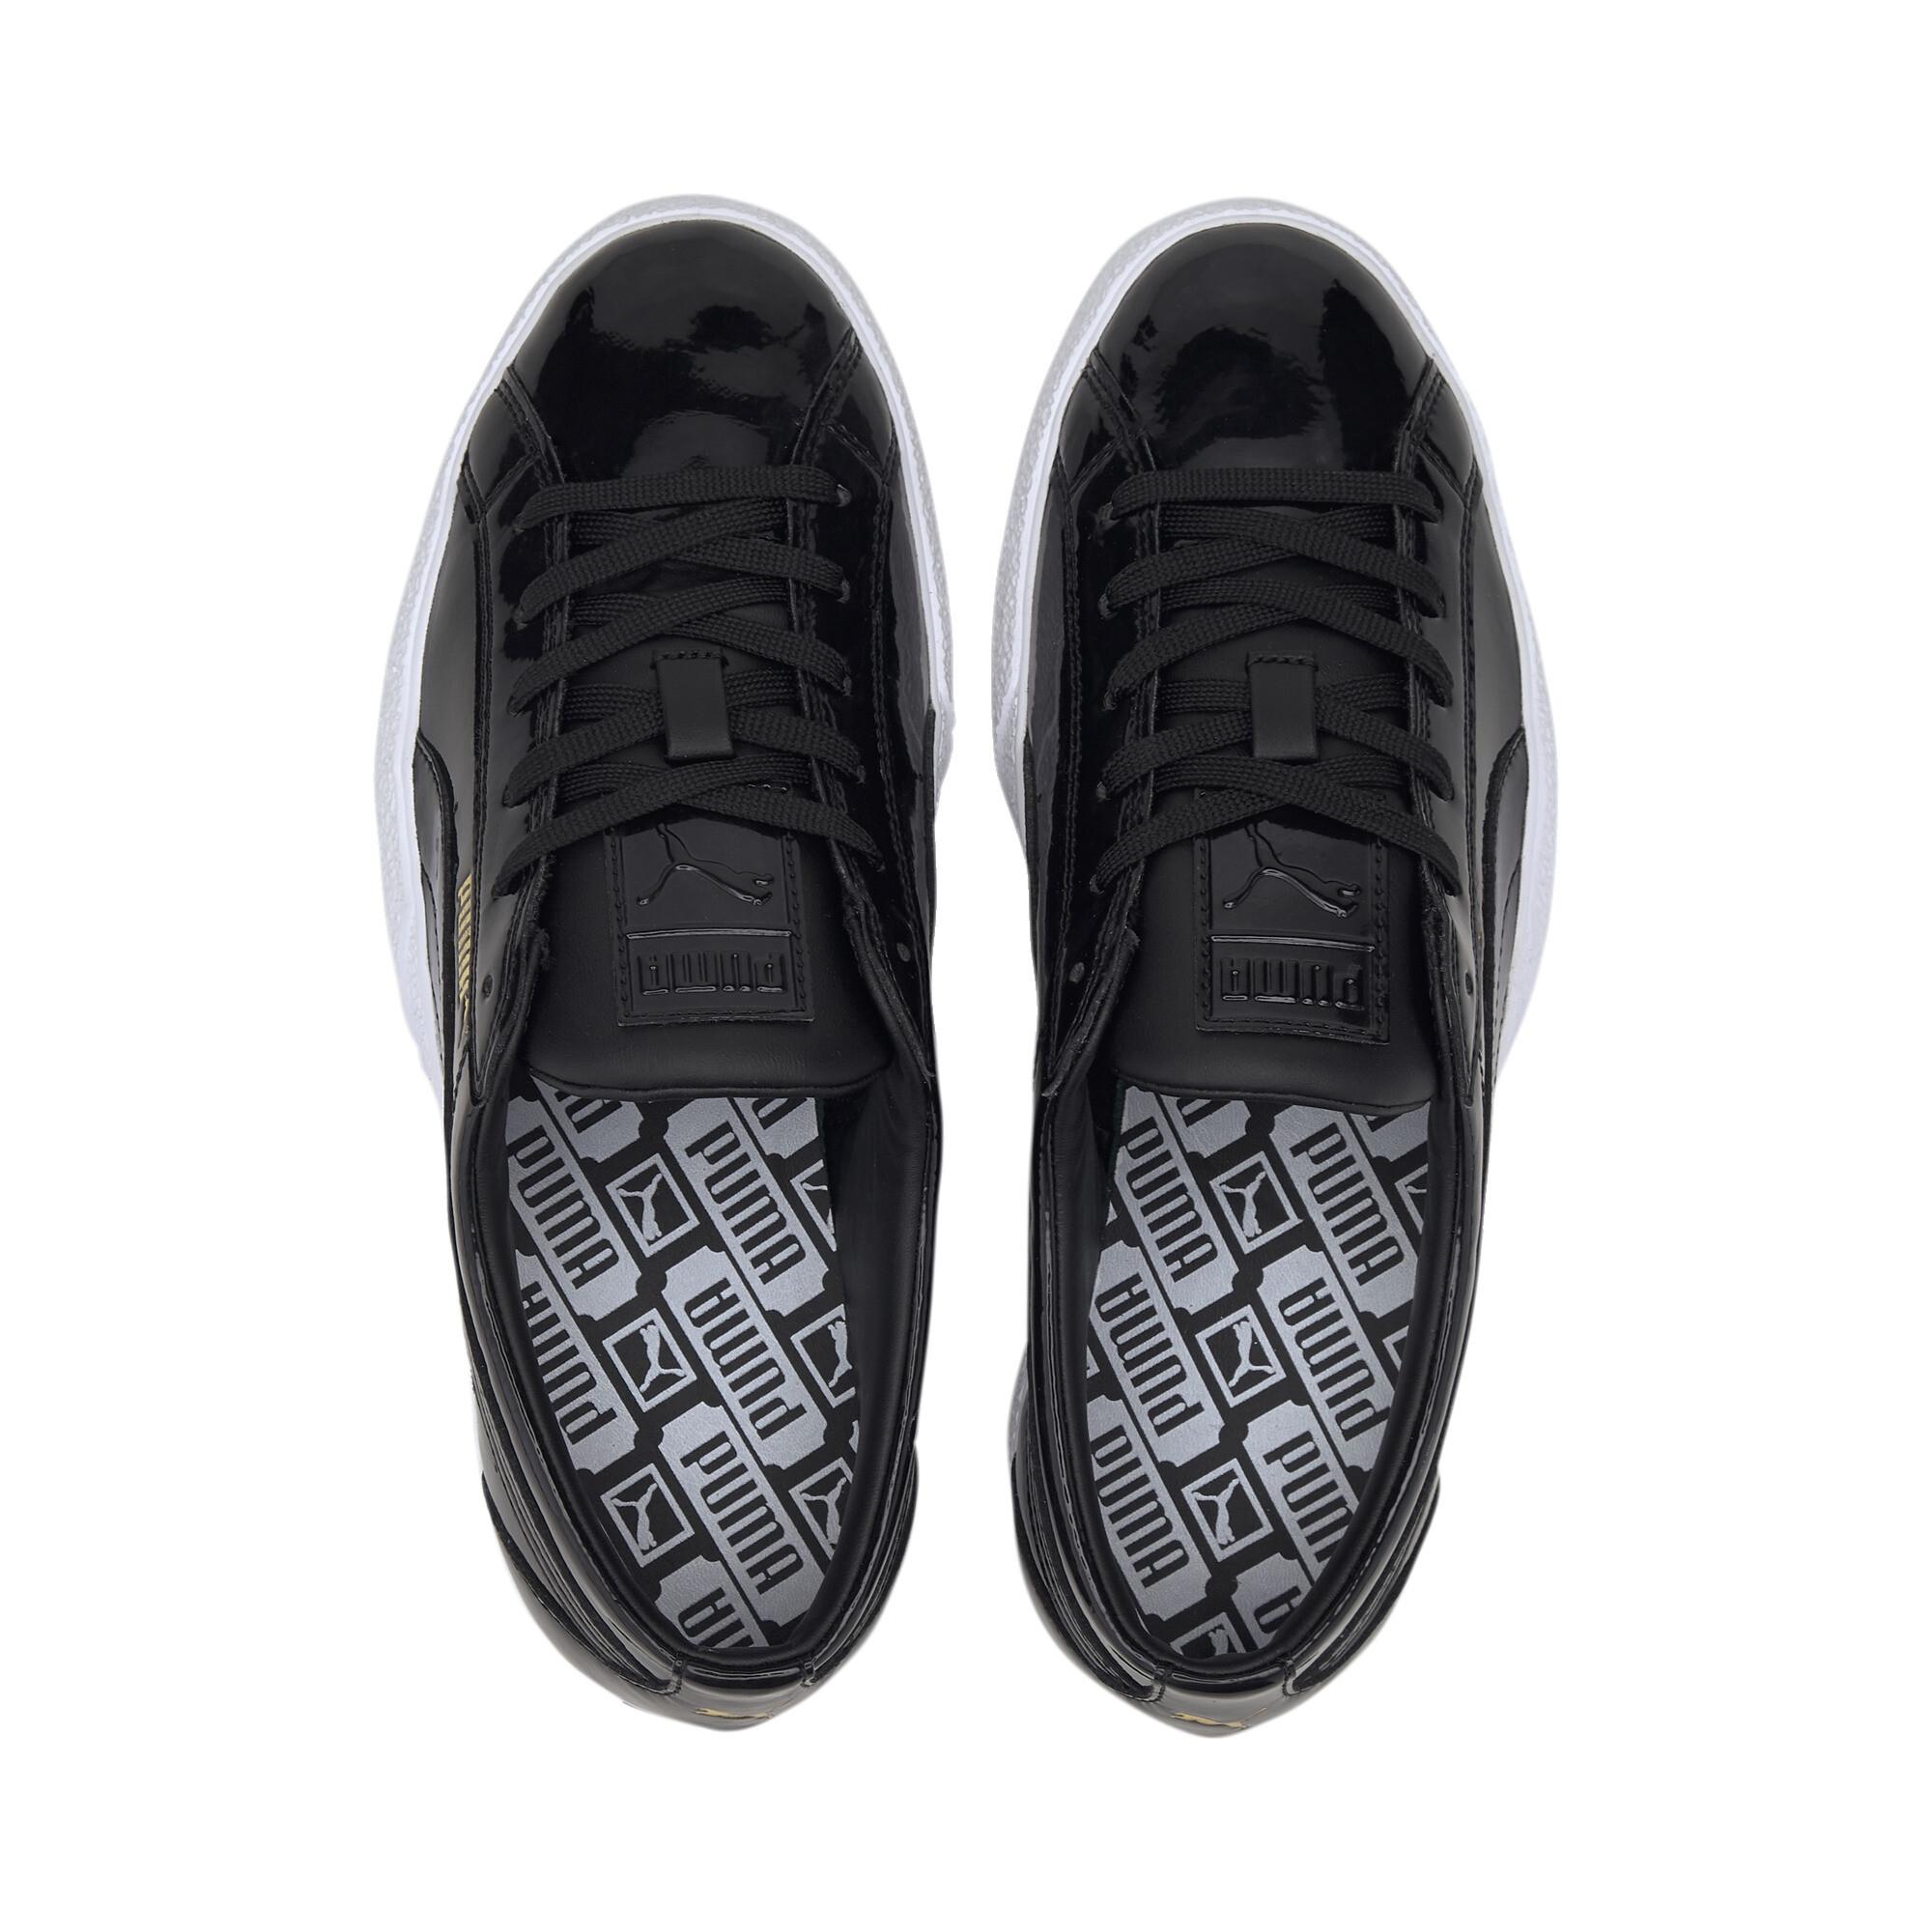 PUMA-Women-039-s-Love-Patent-Sneakers thumbnail 8